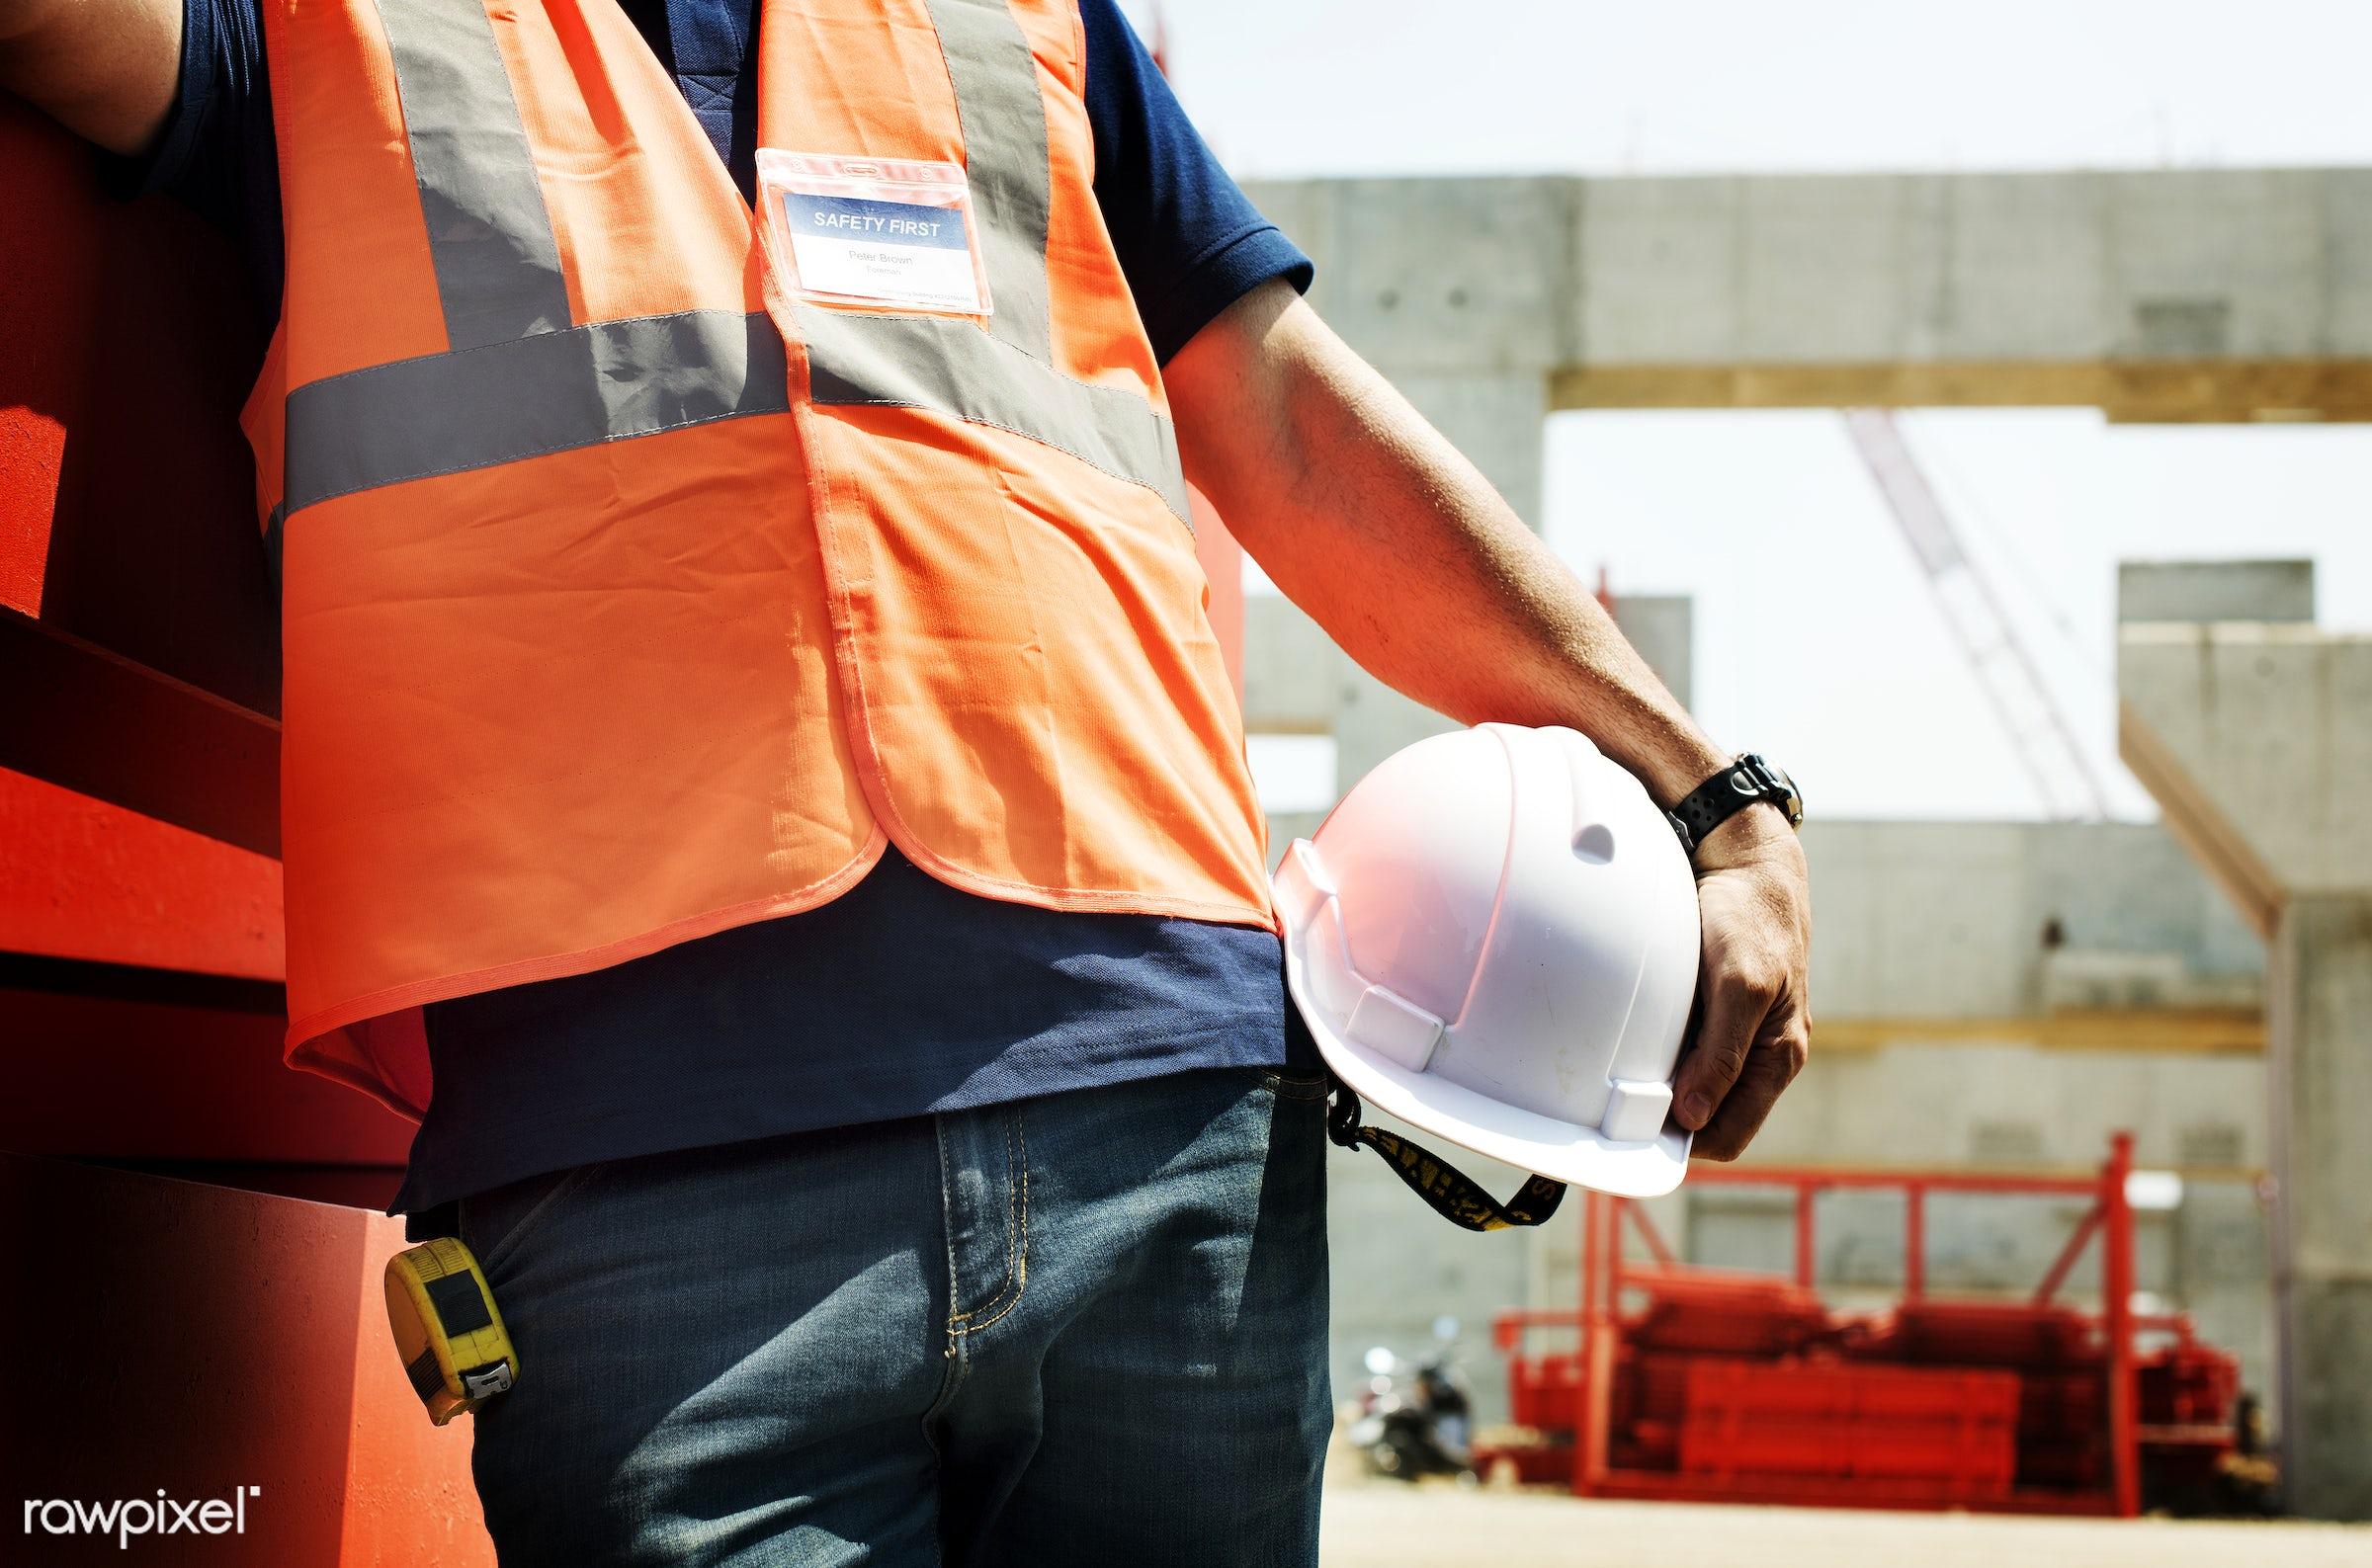 building, built, career, closeup, construction, construction site, control, engineer, engineering, hardhat, helmet, holding...